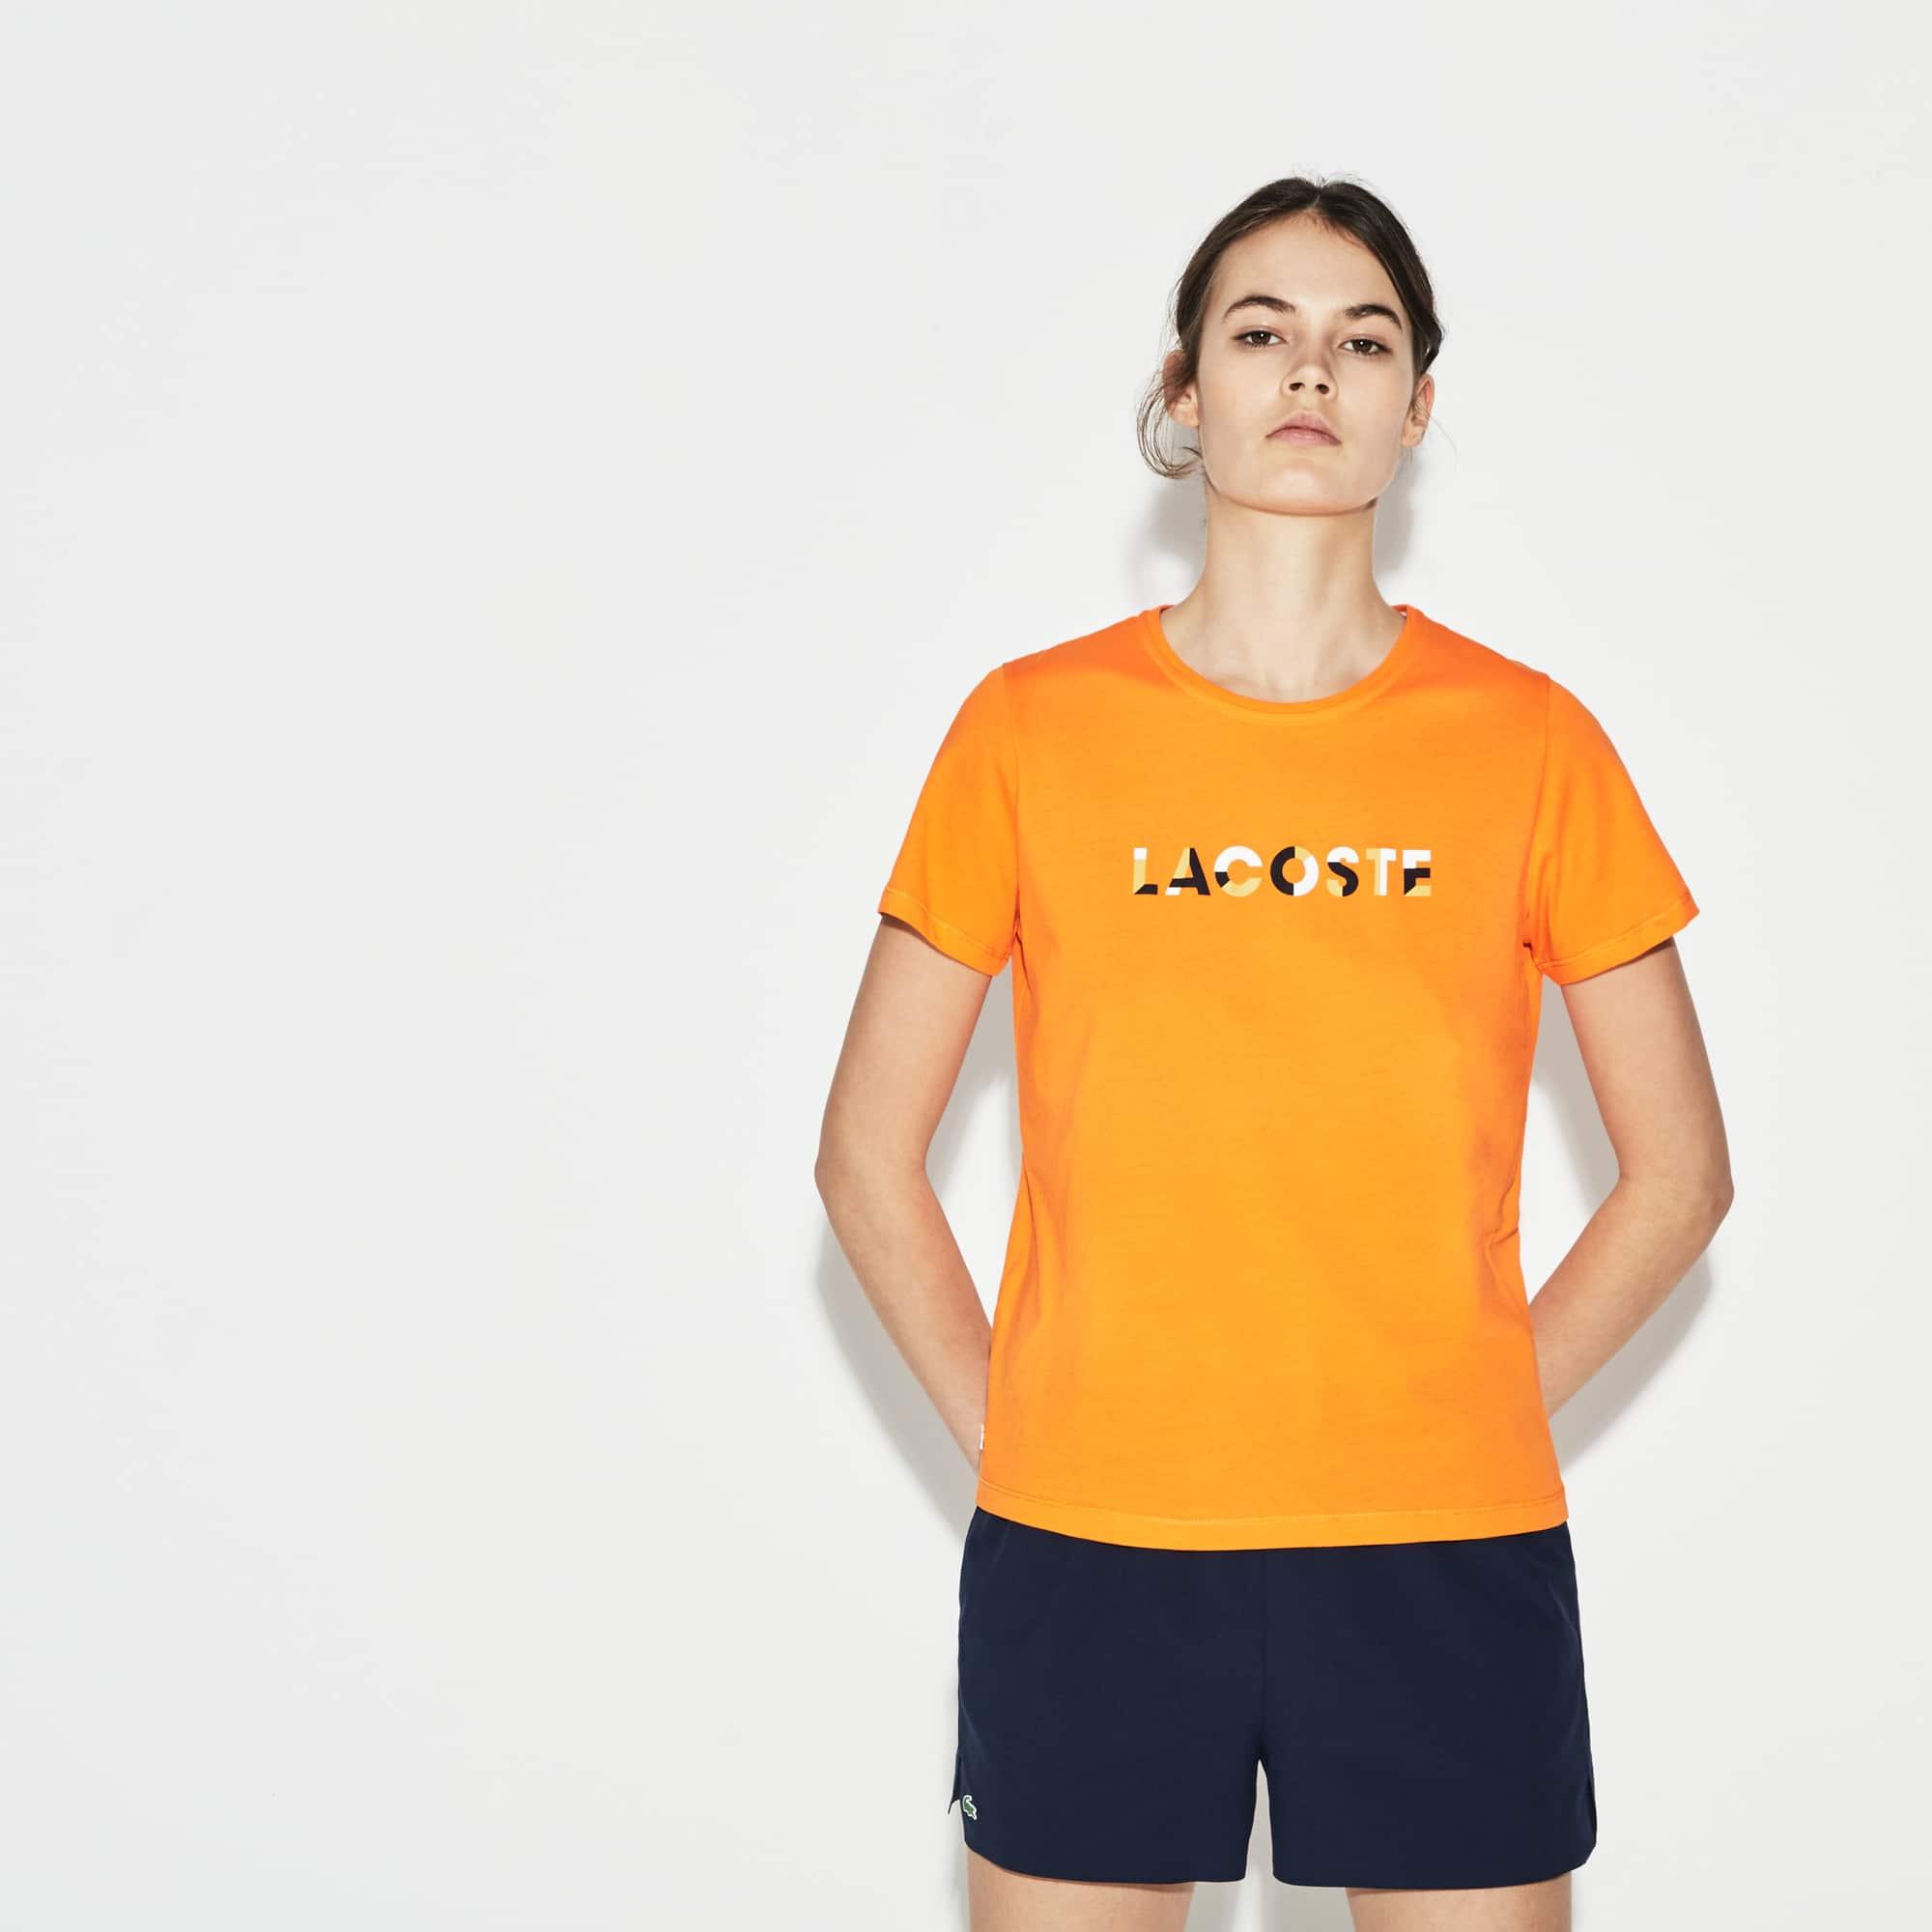 3ee146e4 Women's T Shirts | Lacoste T Shirts for Women | LACOSTE